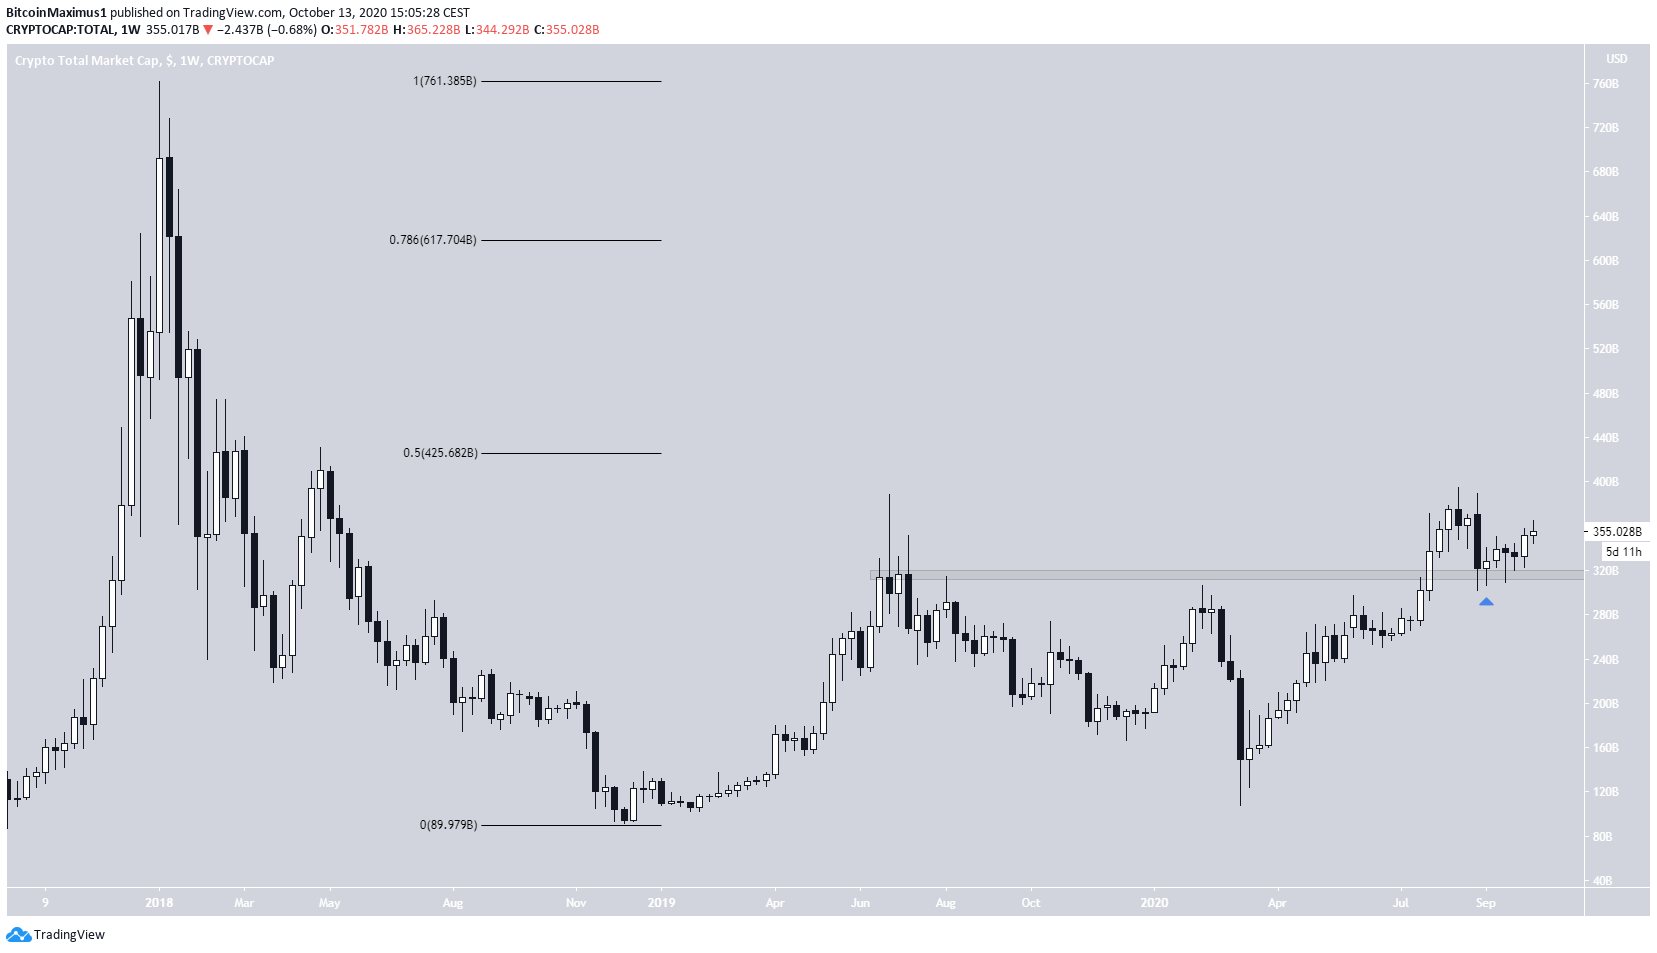 Long-Term Market Cap